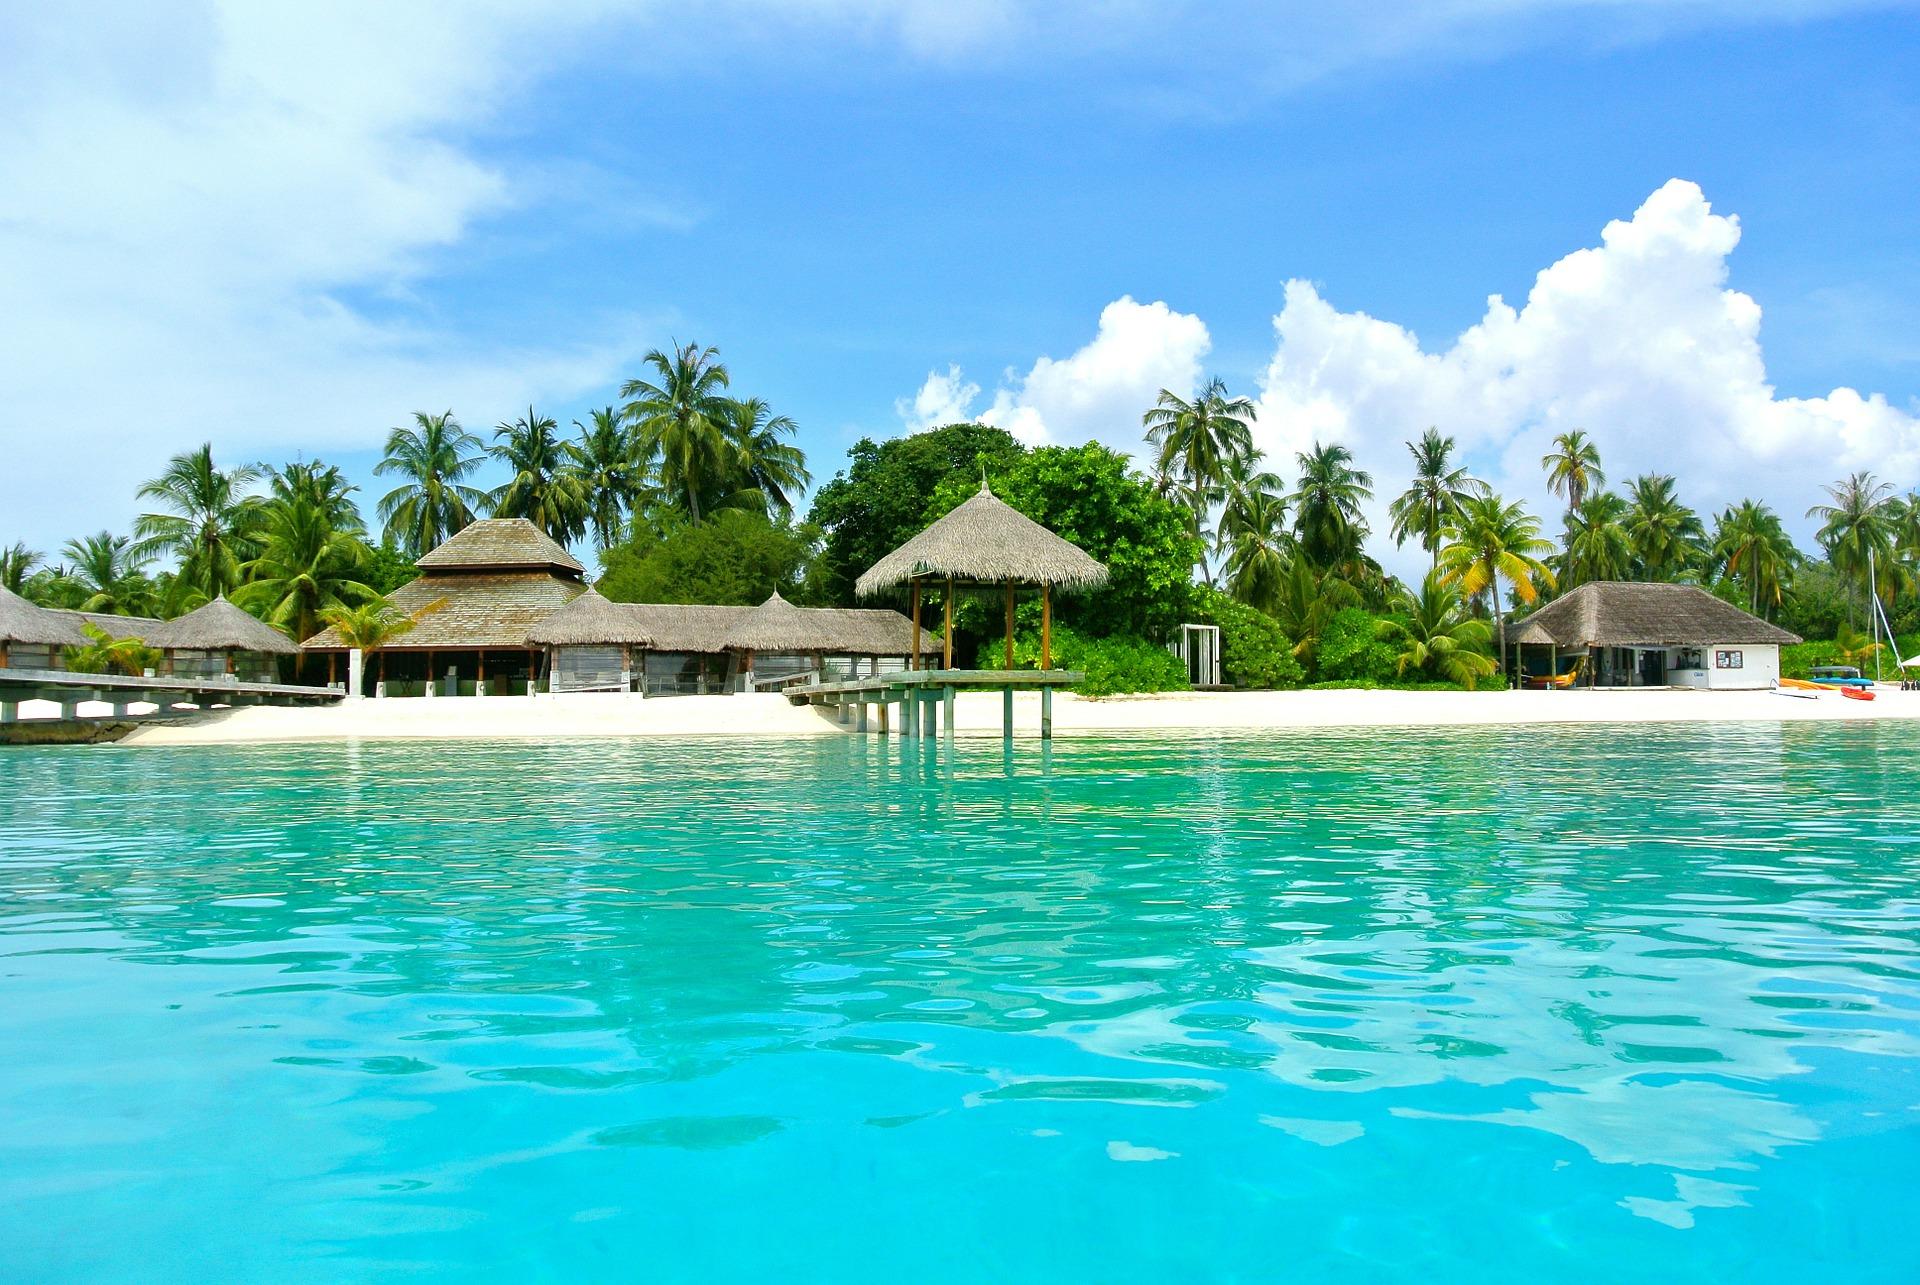 maldives-262516_1920